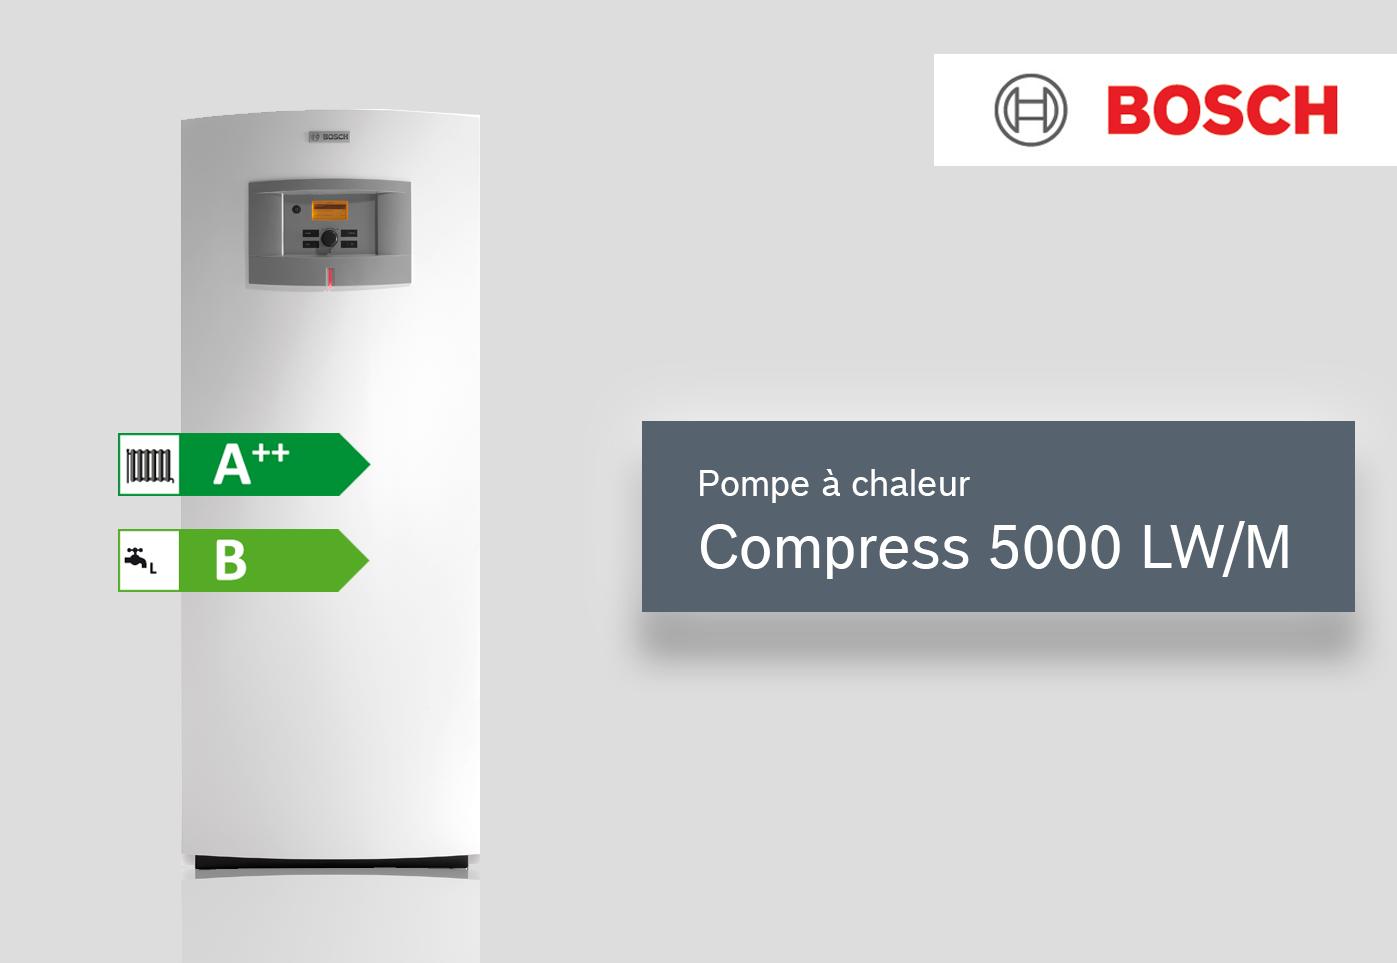 COMPRESS 5000 LWM